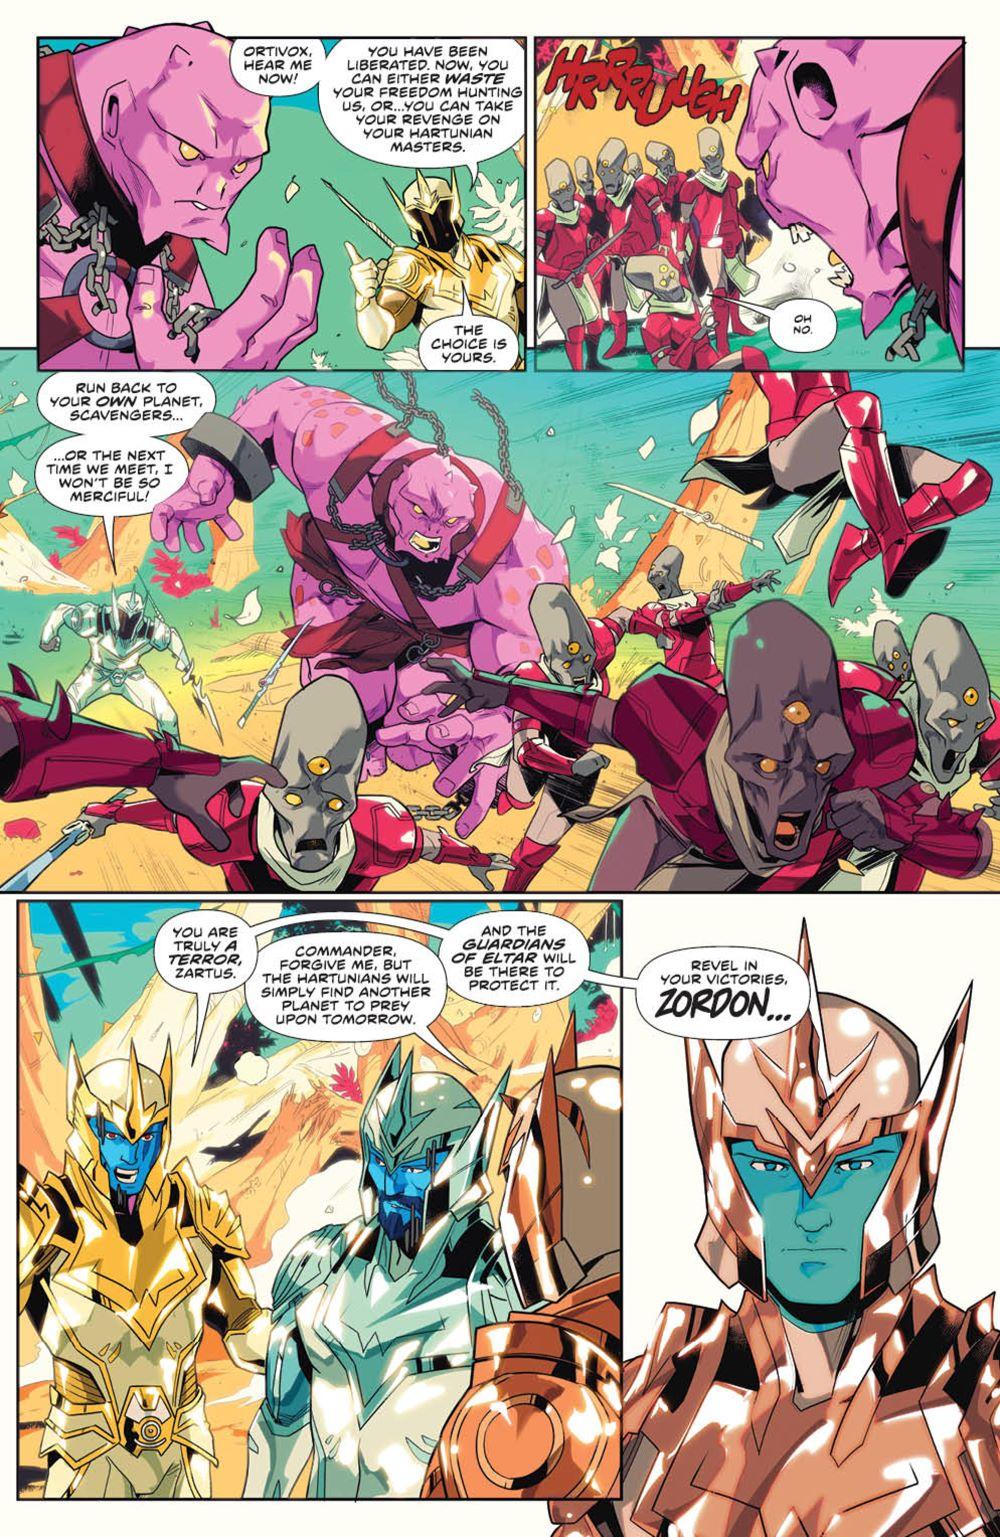 MightyMorphin_v1_SC_PRESS_10 ComicList Previews: MIGHTY MORPHIN VOLUME 1 TP